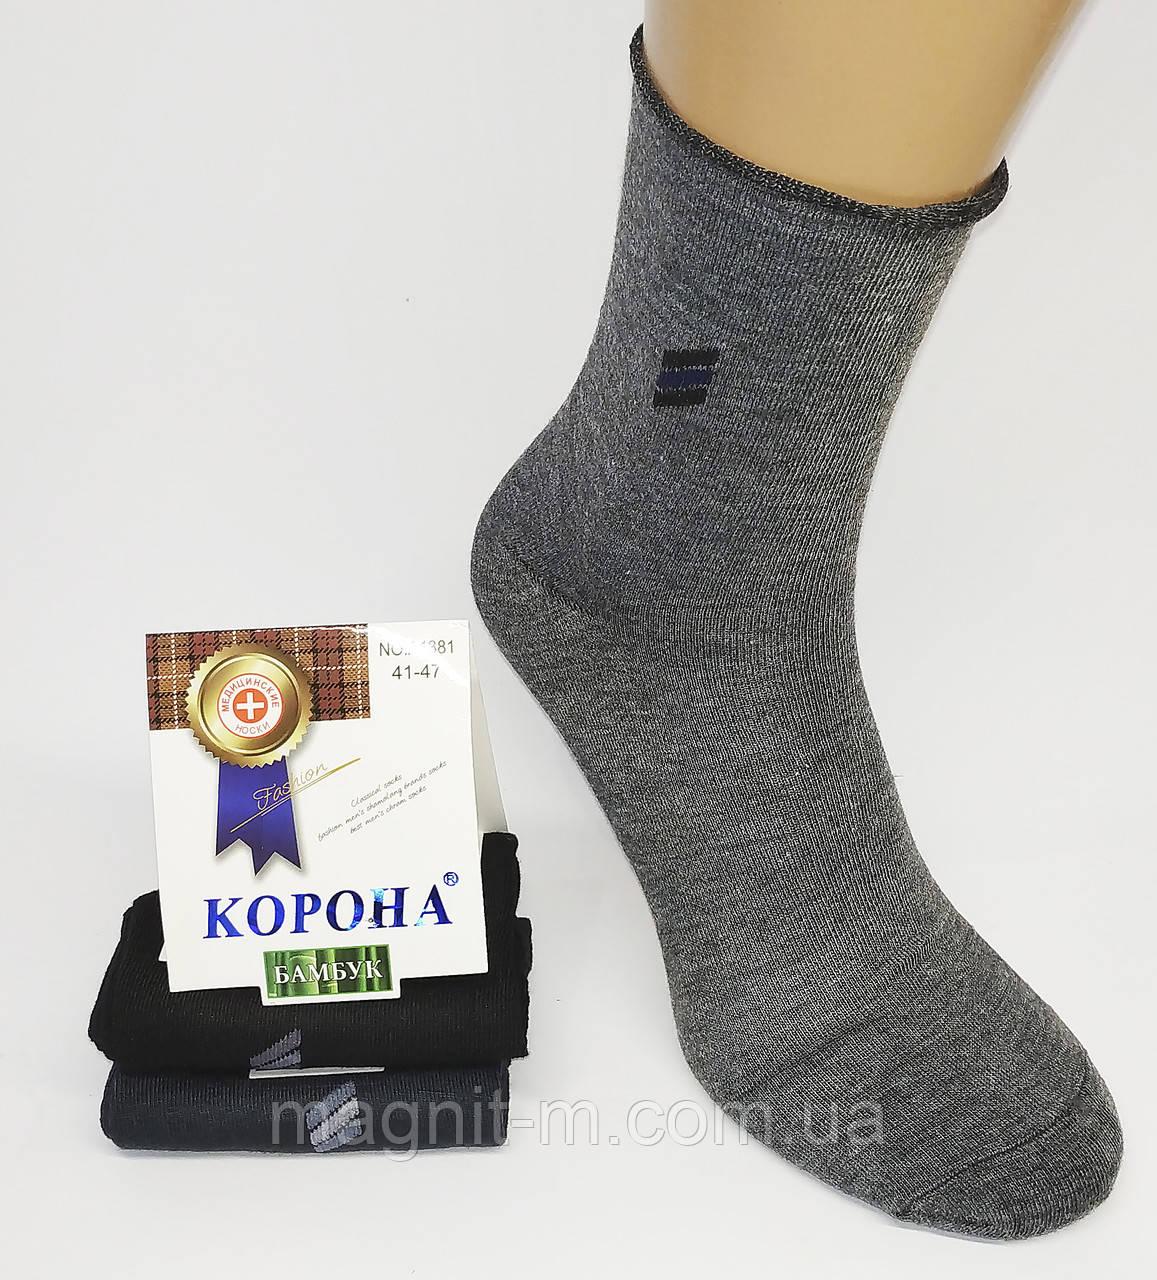 "Мужские носки ""КОРОНА бамбук"". Медицинская резинка. № A1381."